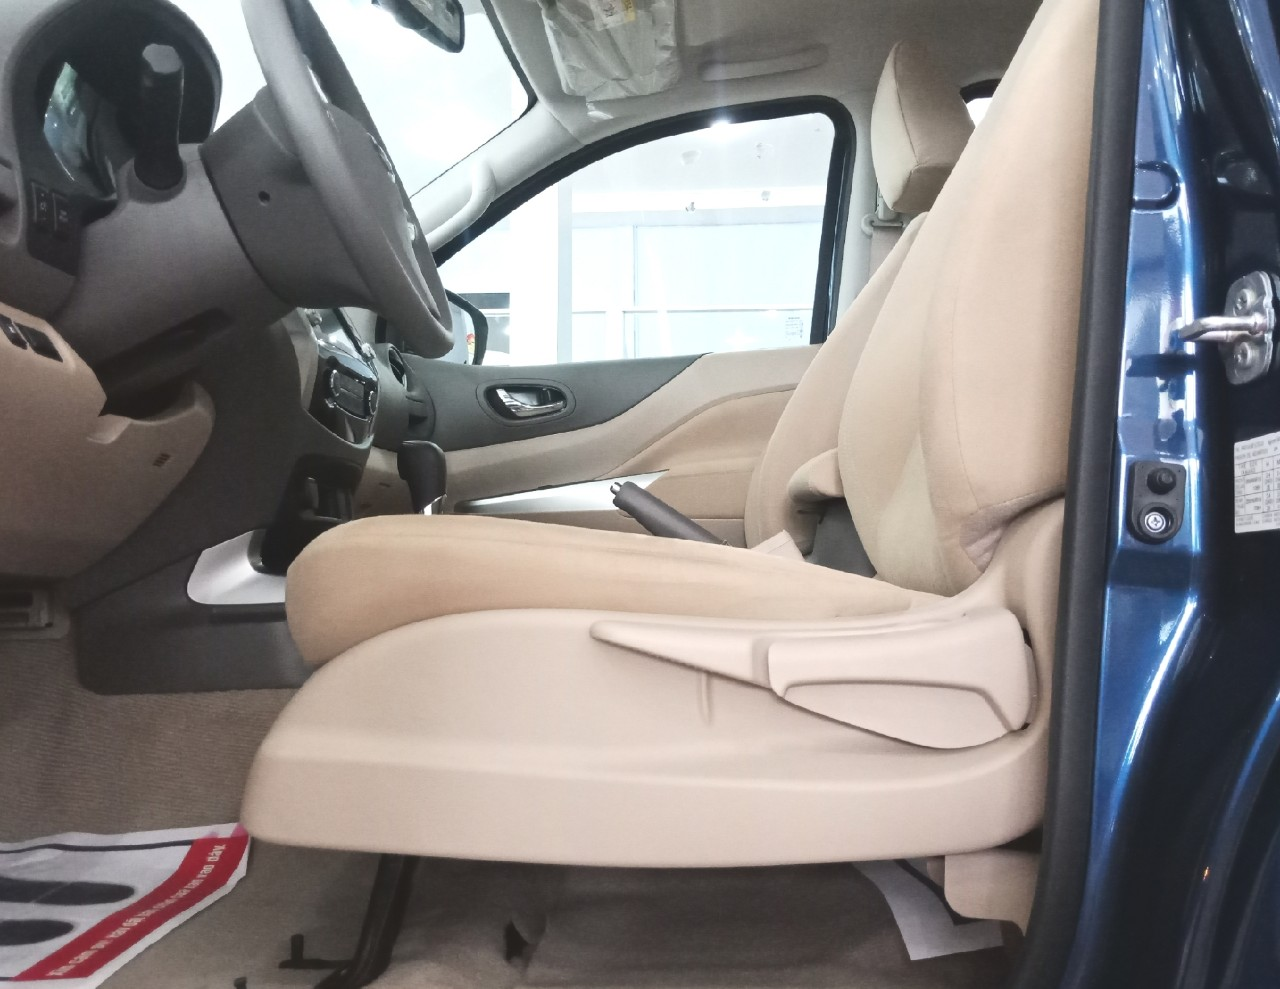 Bán Nissan Navara EL A IVI 2019 siêu khuyến mãi, gọi ngay 0939 163 442